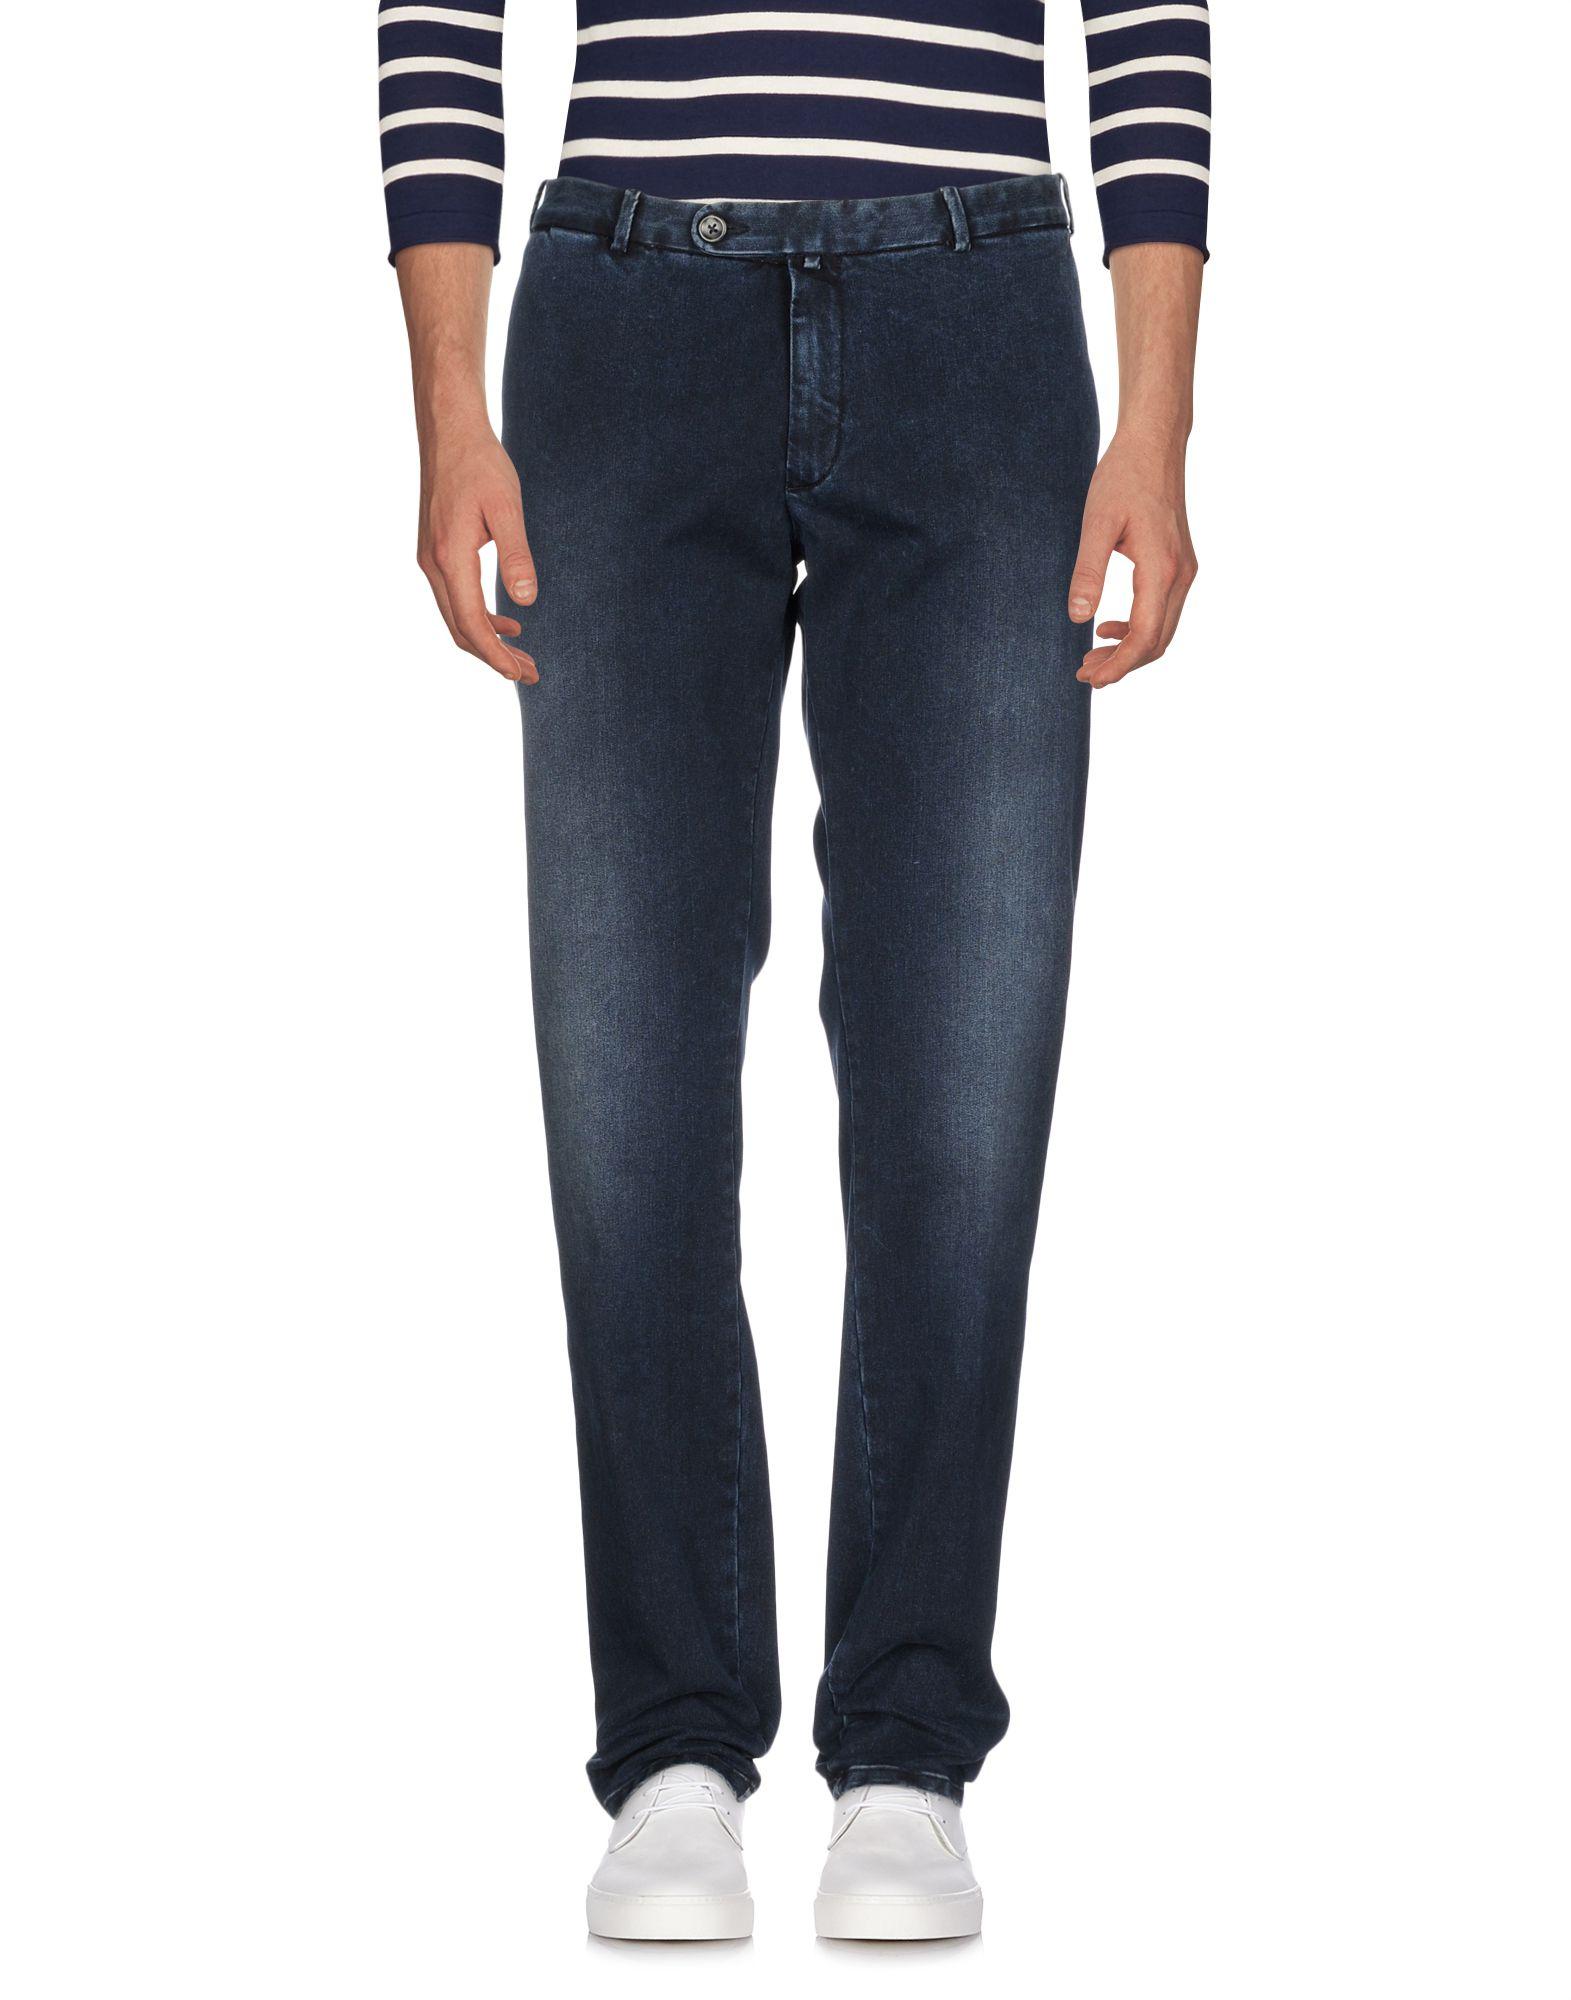 Pantaloni Jeans Luigi Borrelli Napoli Napoli Napoli Uomo - 42644297IH 8e64a6